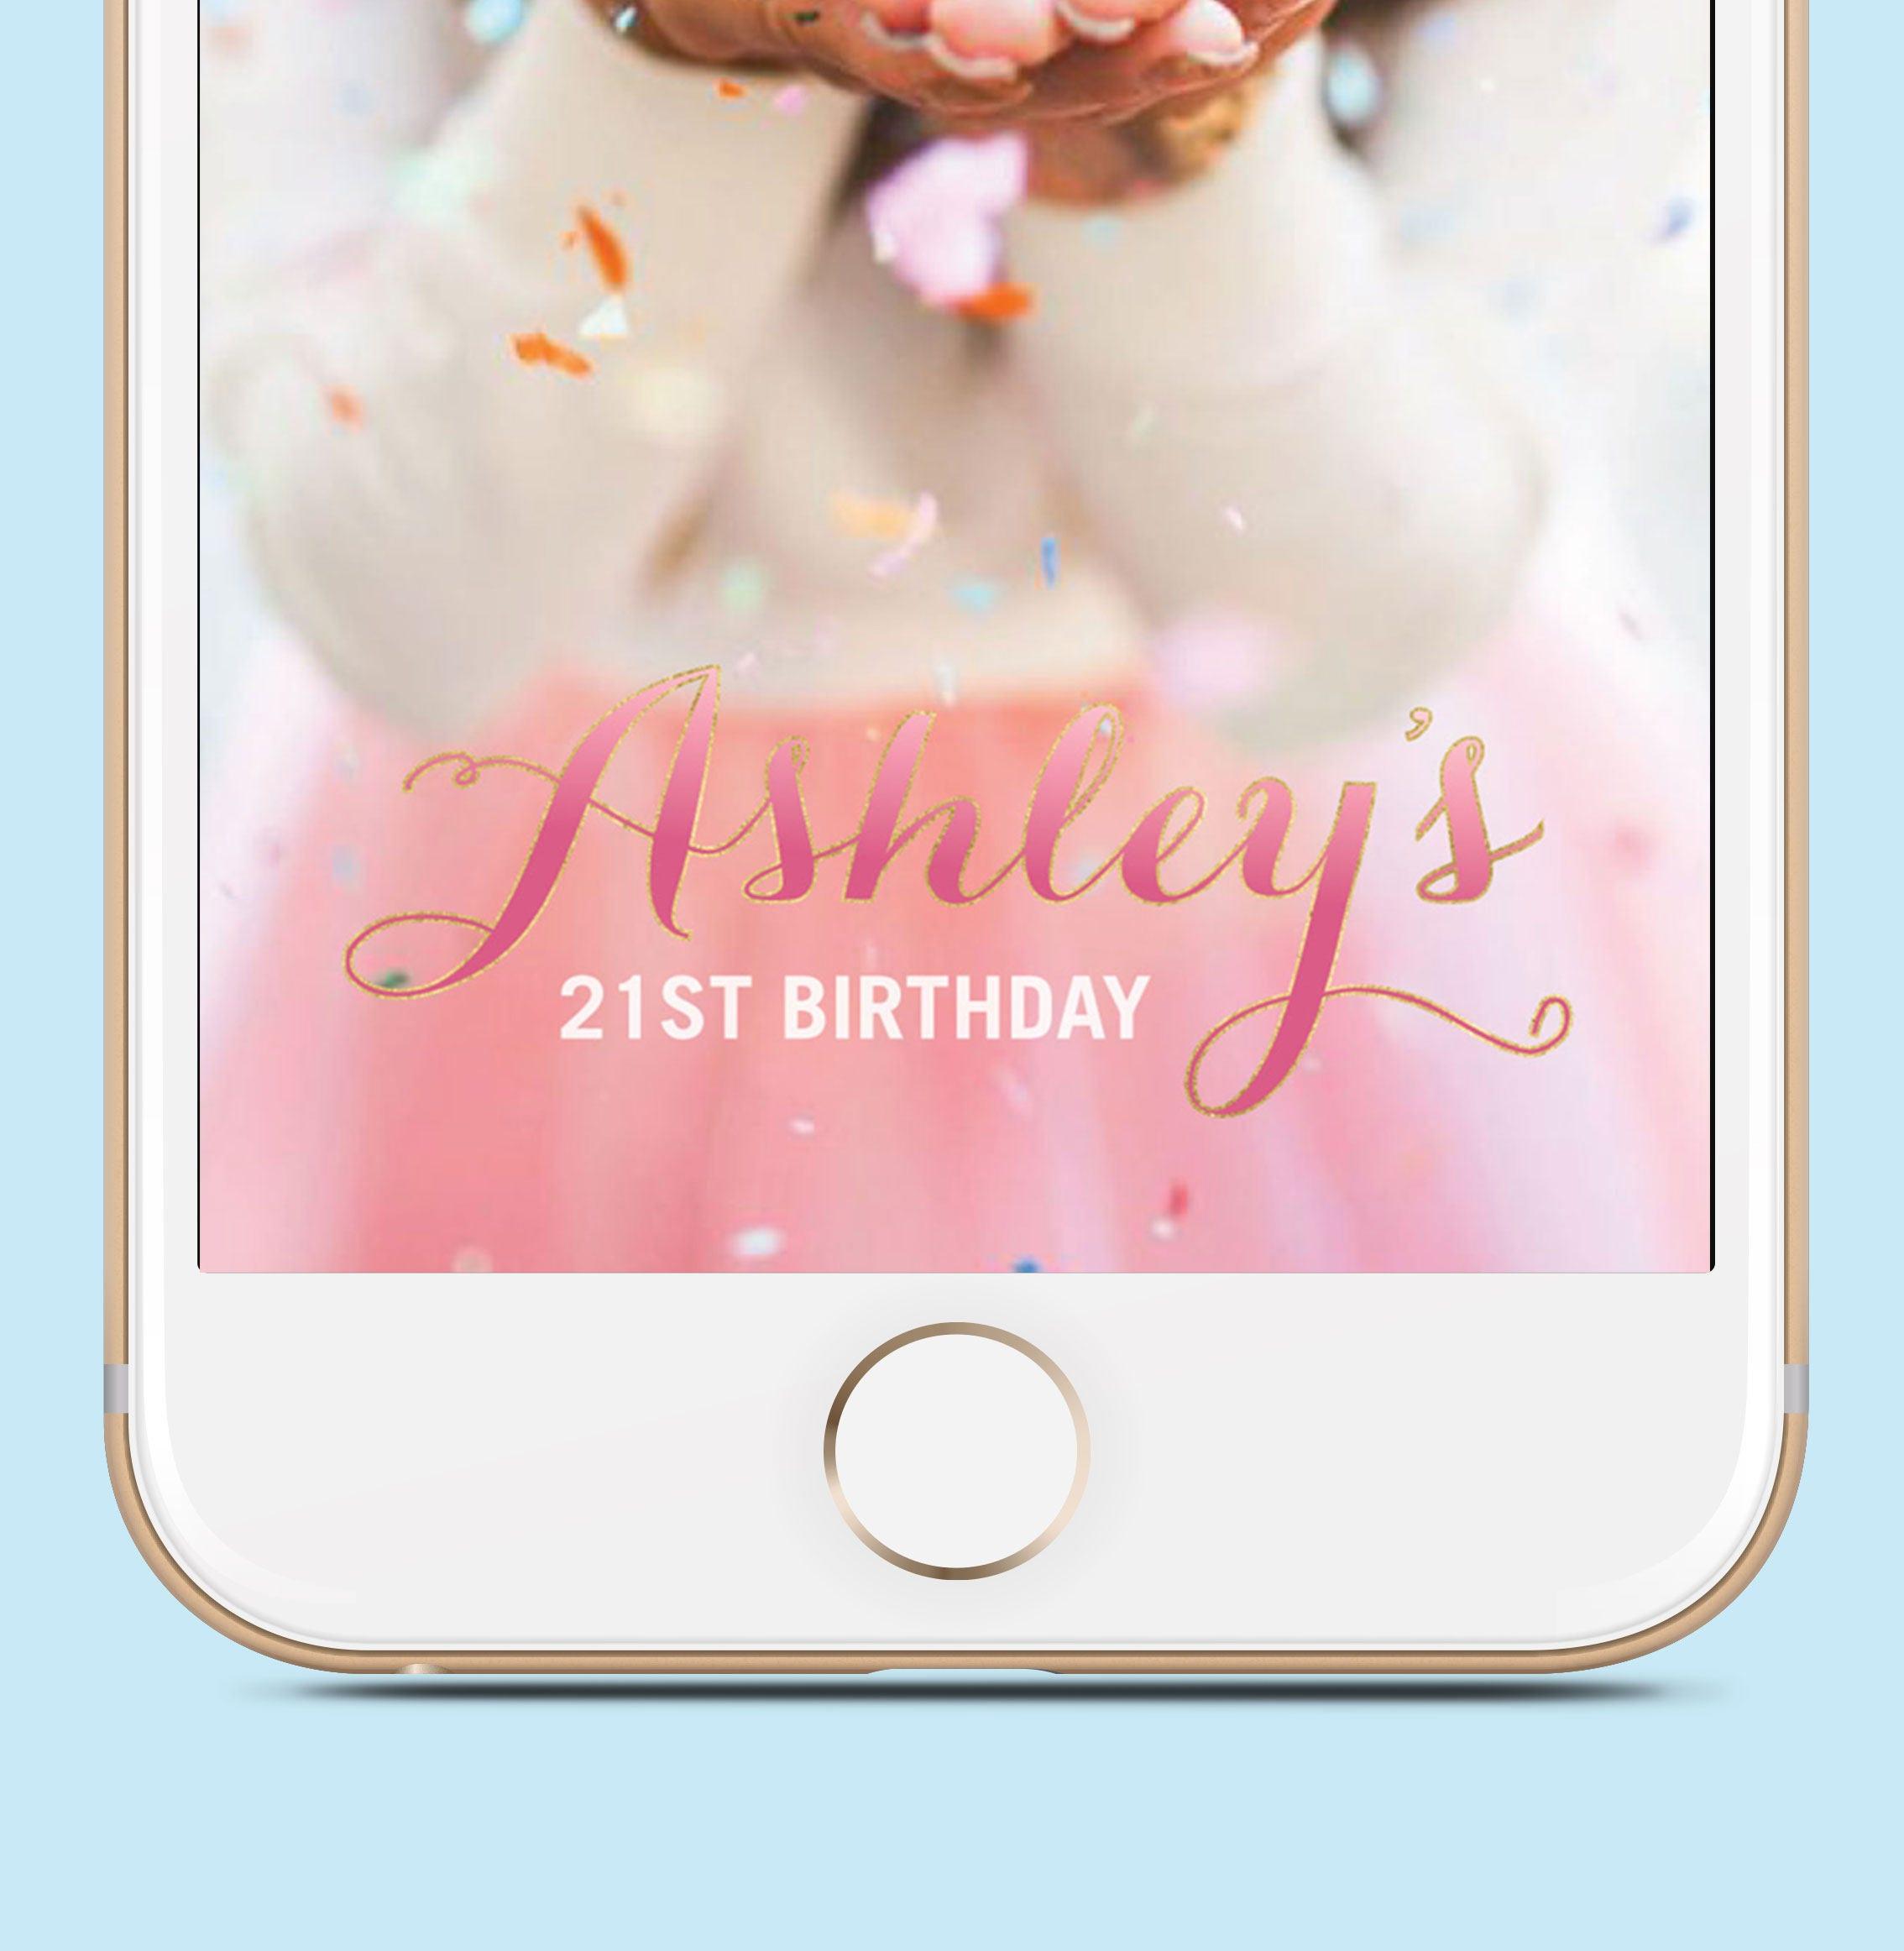 21st Birthday Gift For HerBirthday Snapchat Geofilter 18th